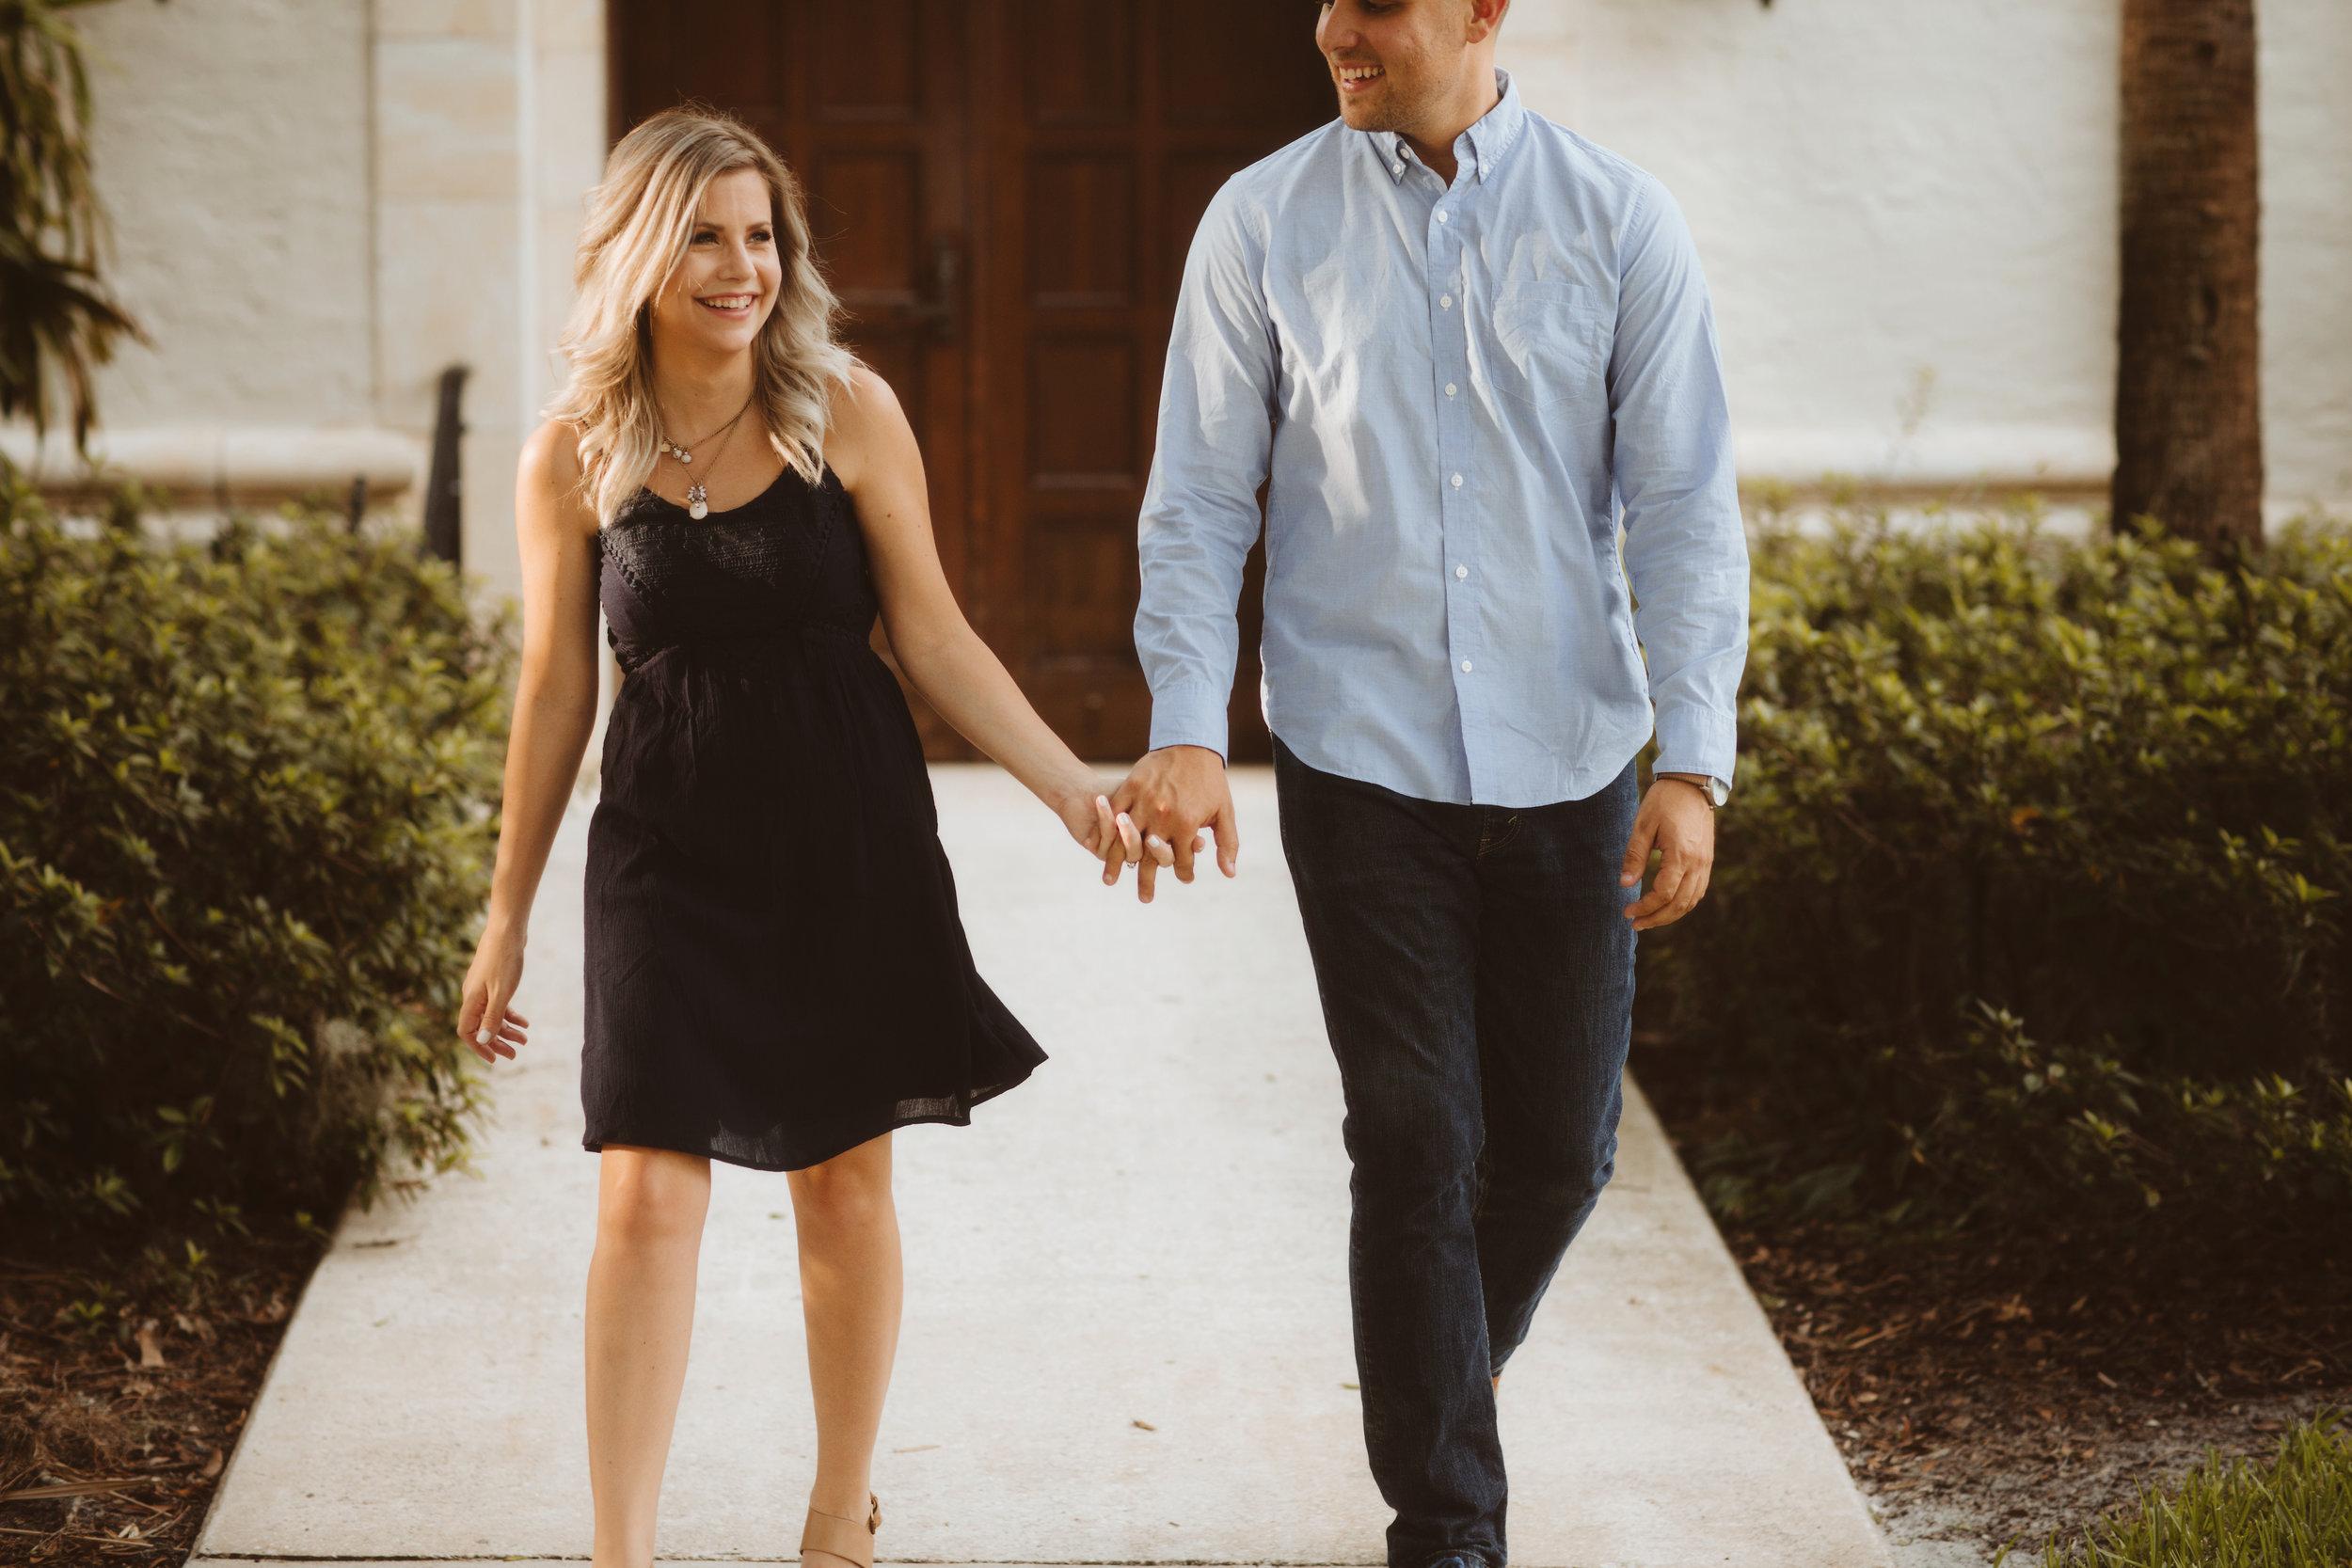 Engagement | Vanessa Boy Photography | vanessaboy.com |-20-2.com |final .jpg